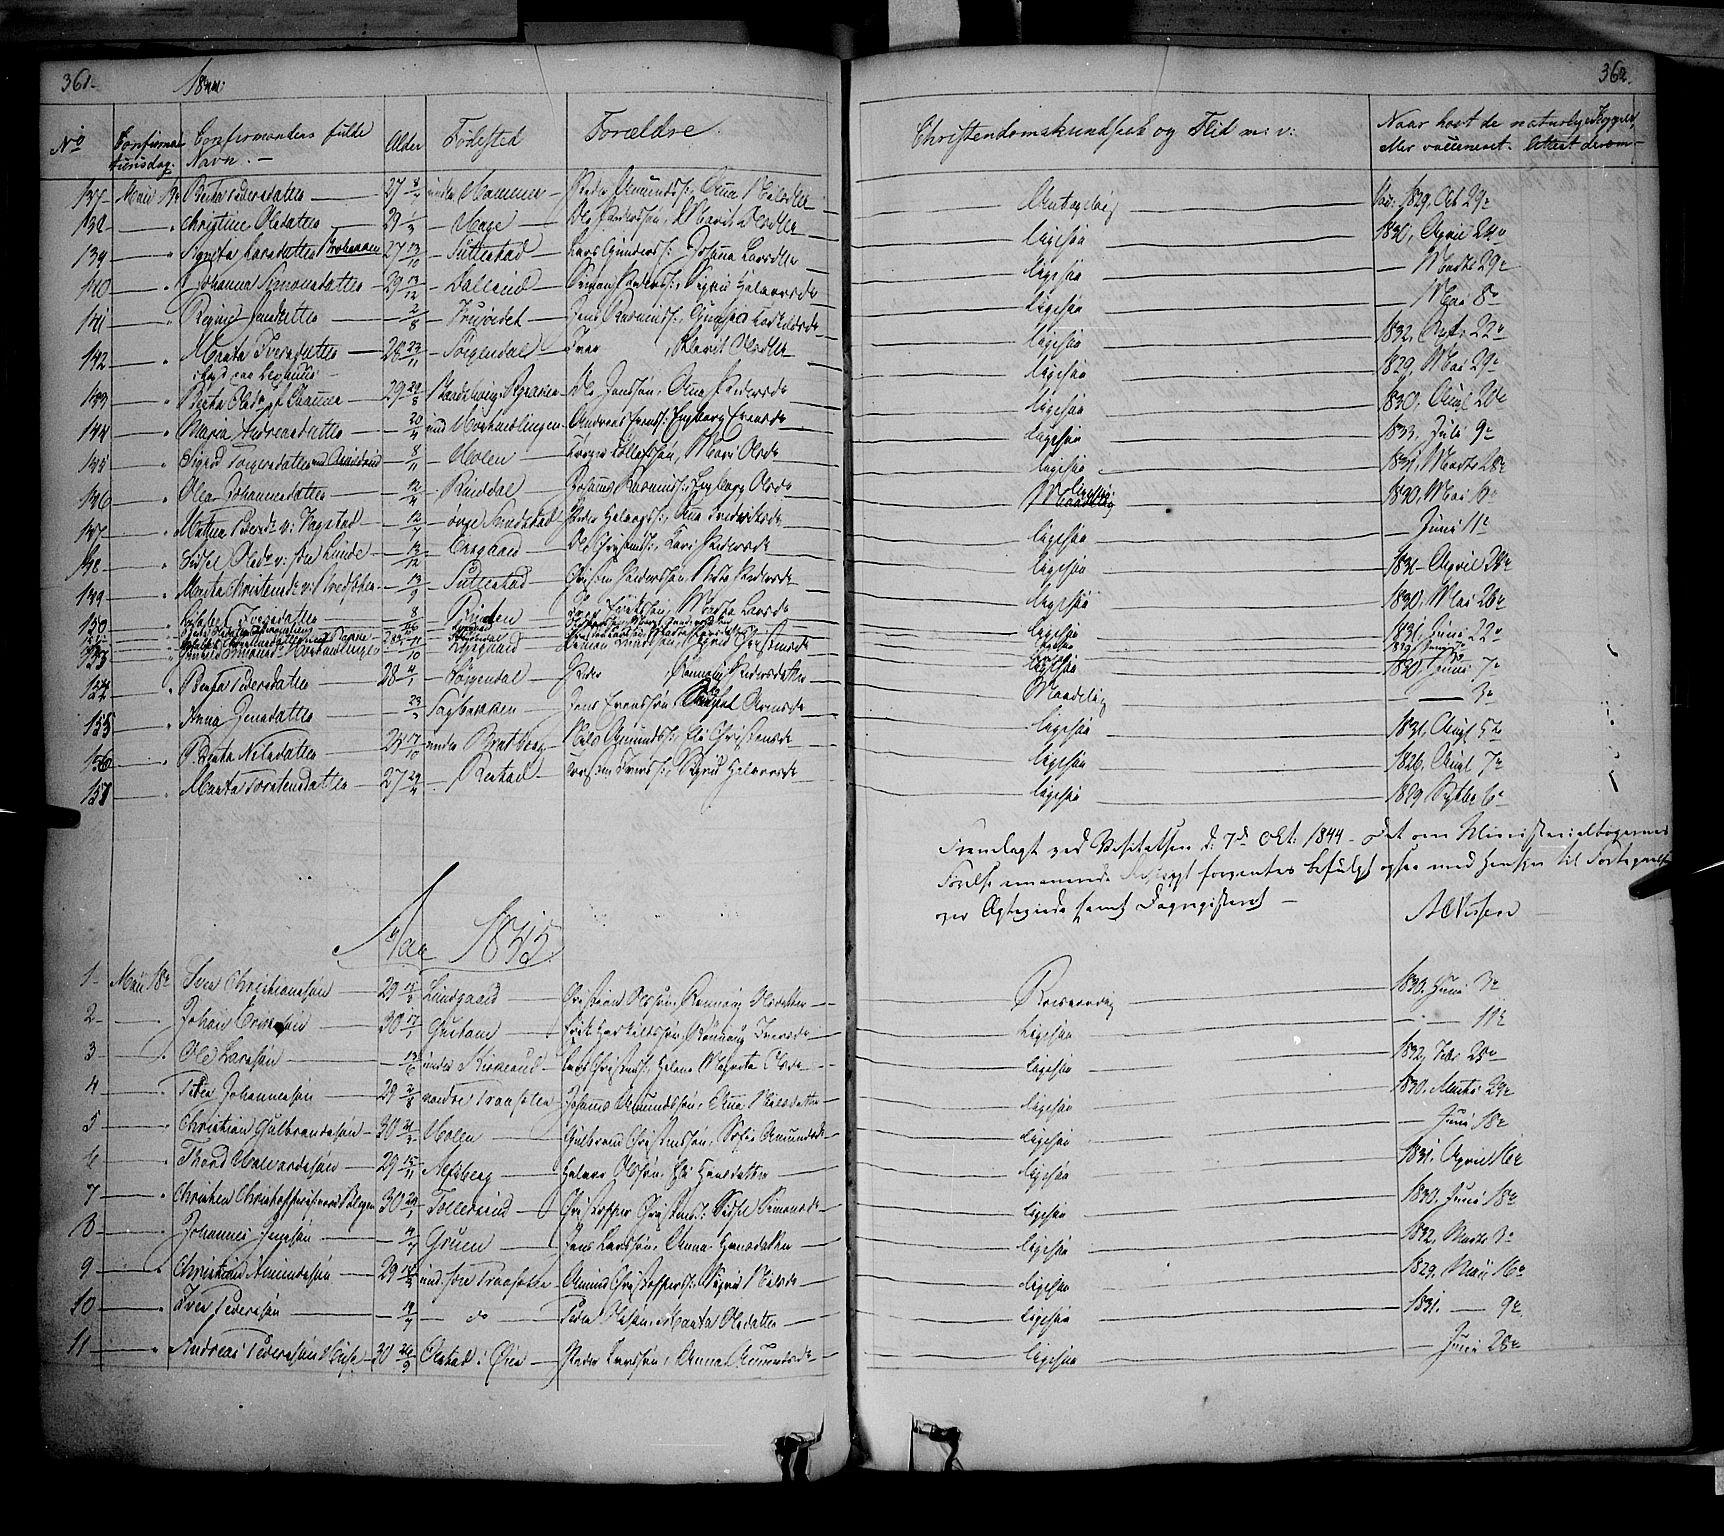 SAH, Fåberg prestekontor, Ministerialbok nr. 5, 1836-1854, s. 361-362